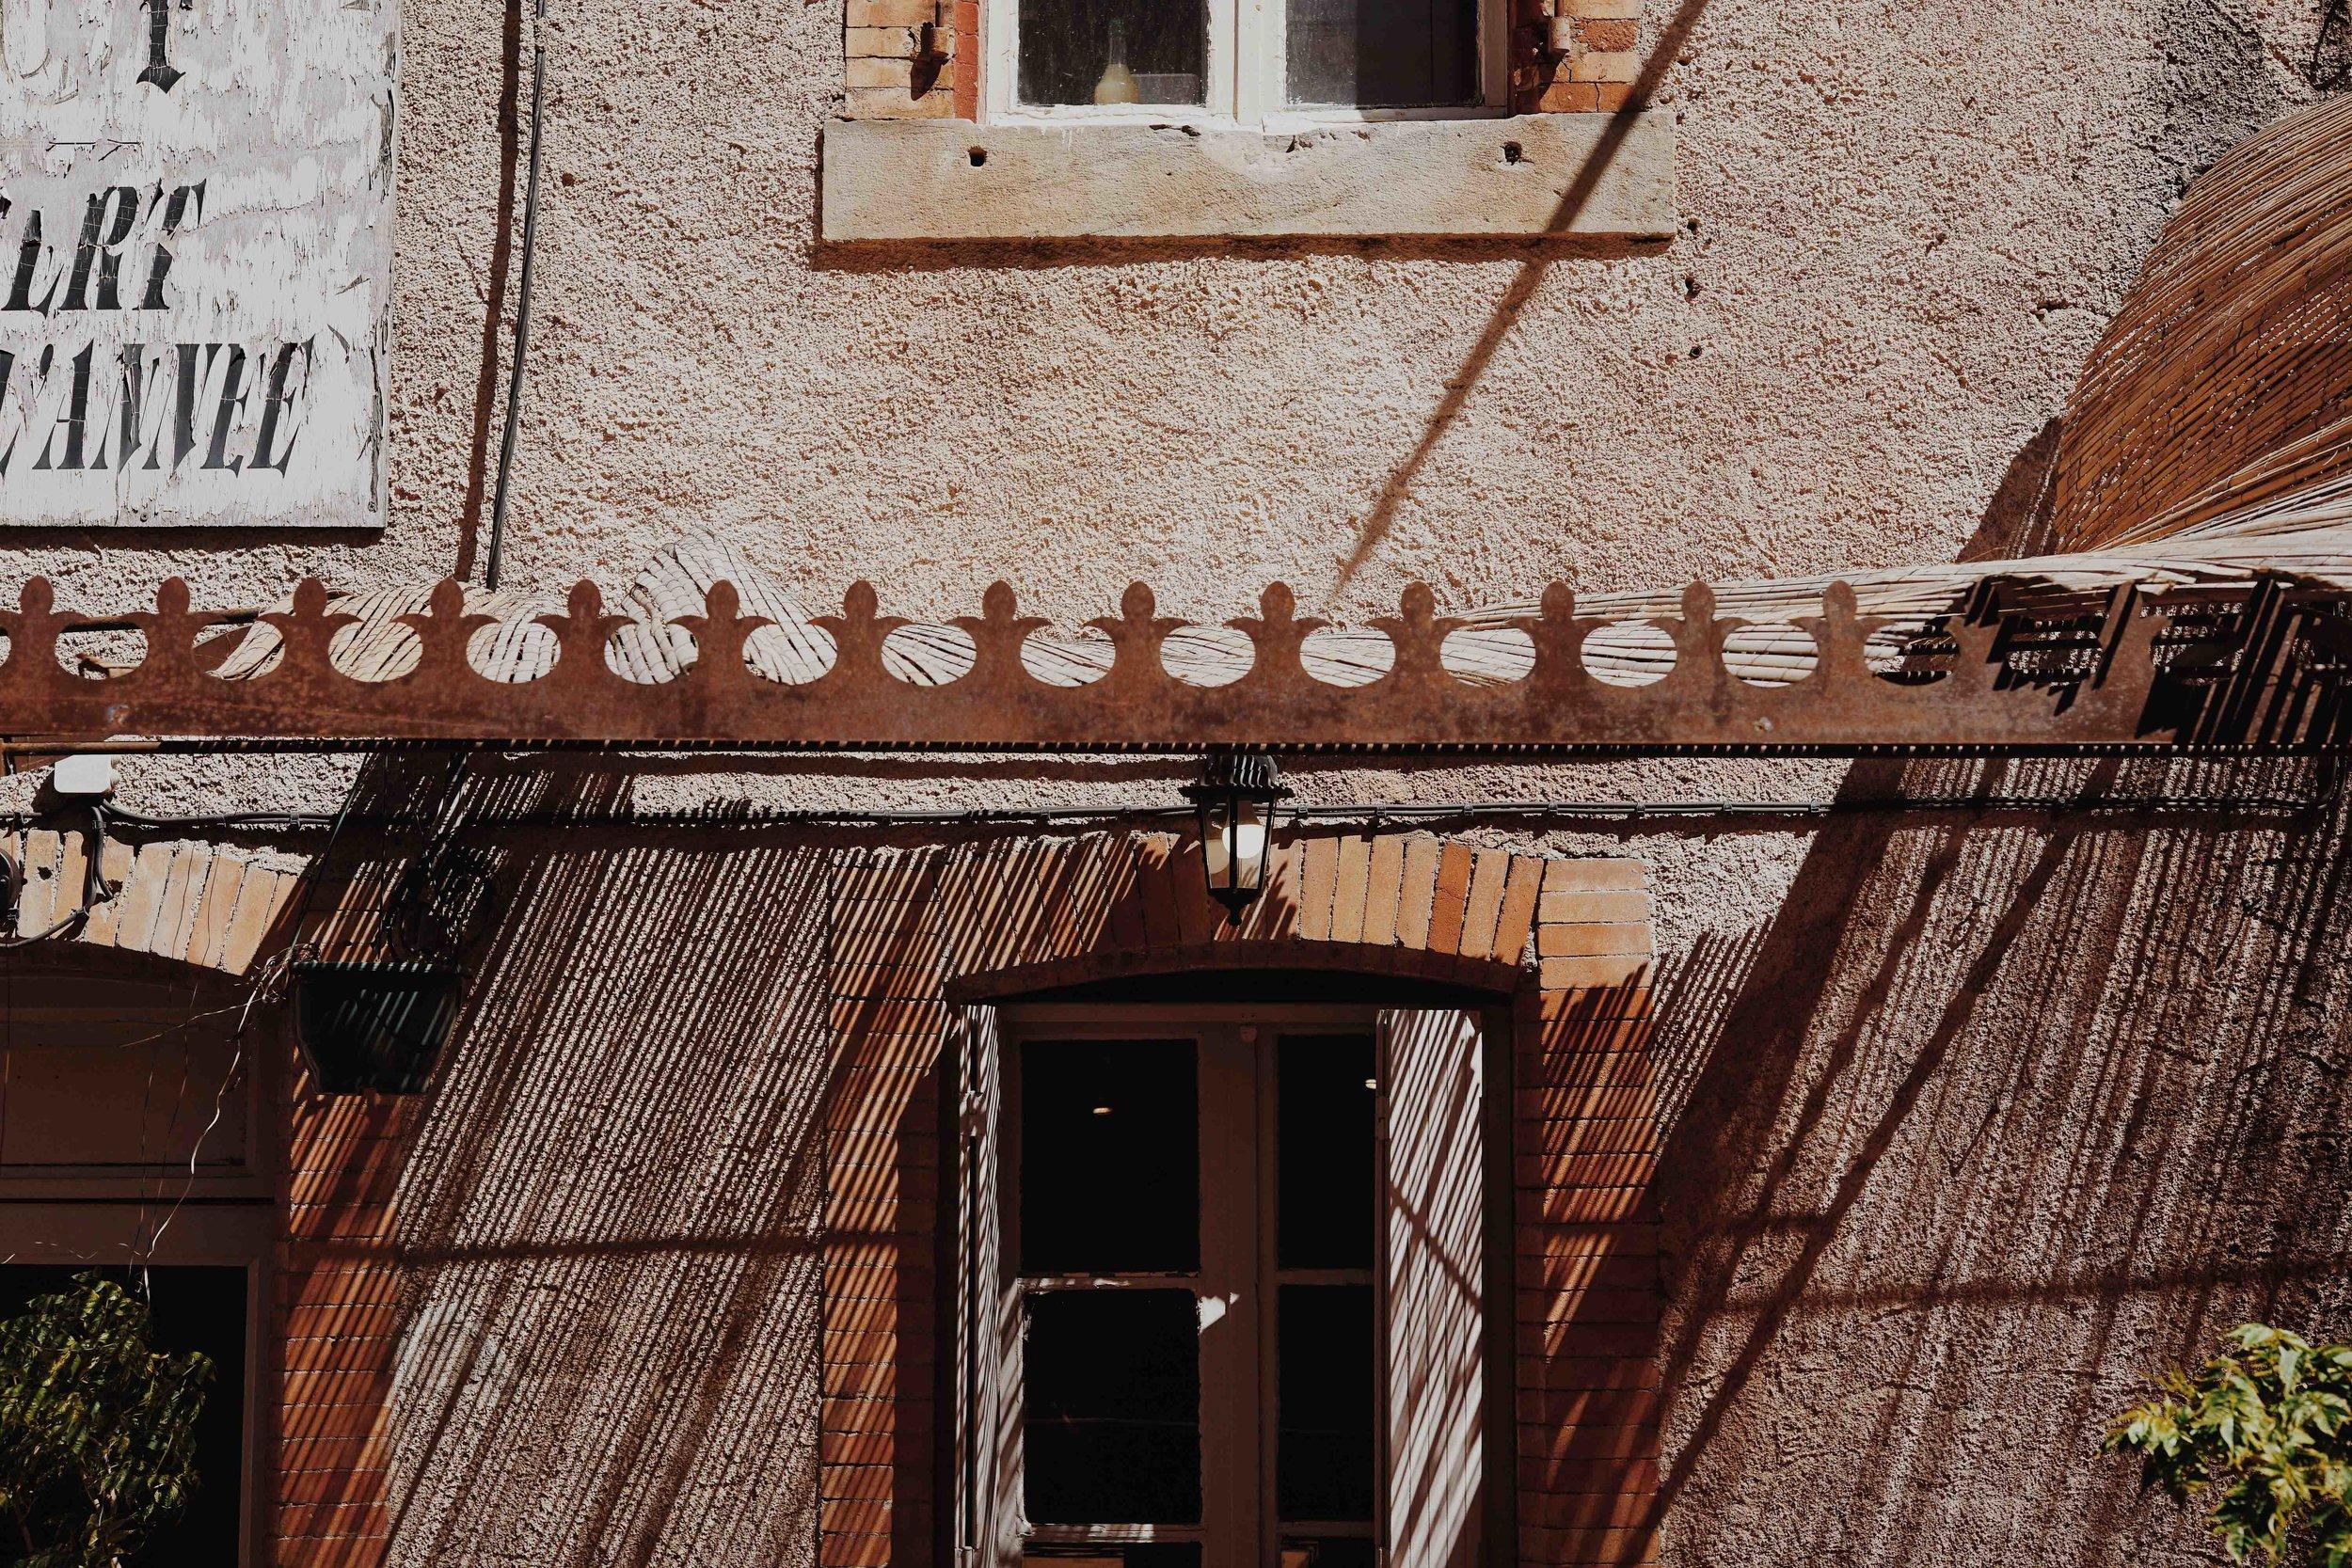 ASROSENVINGE_AtoutFrance_Occitanie_Toulouse_LowRes-255.jpg